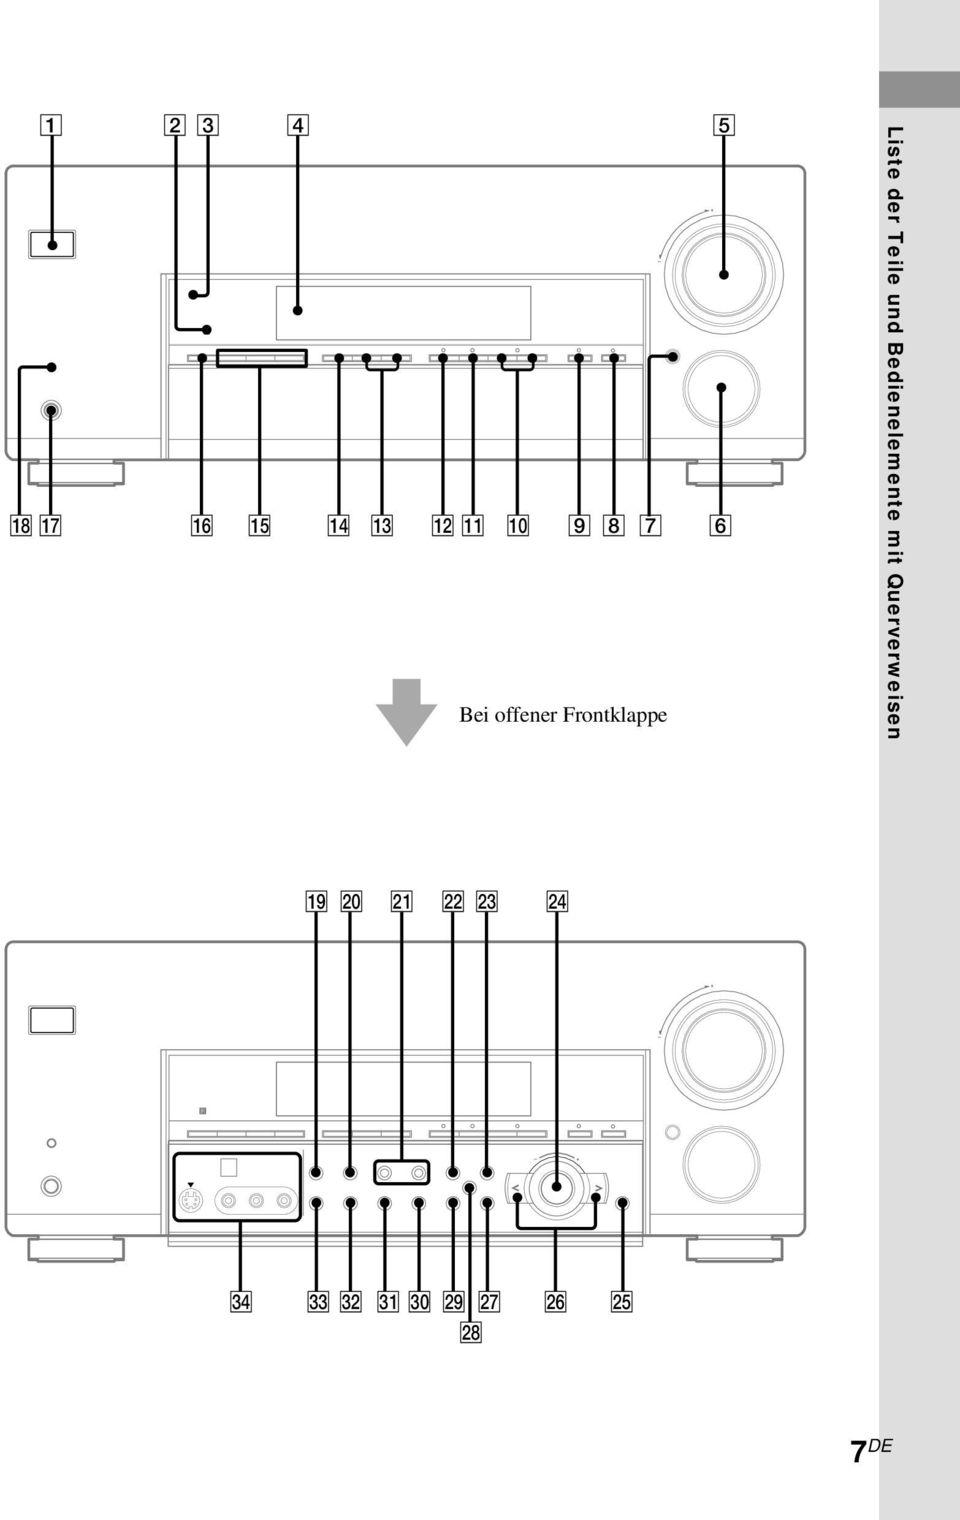 Nektar Impact Lx88 Manual Pdf. Entstehung der Bibliothek